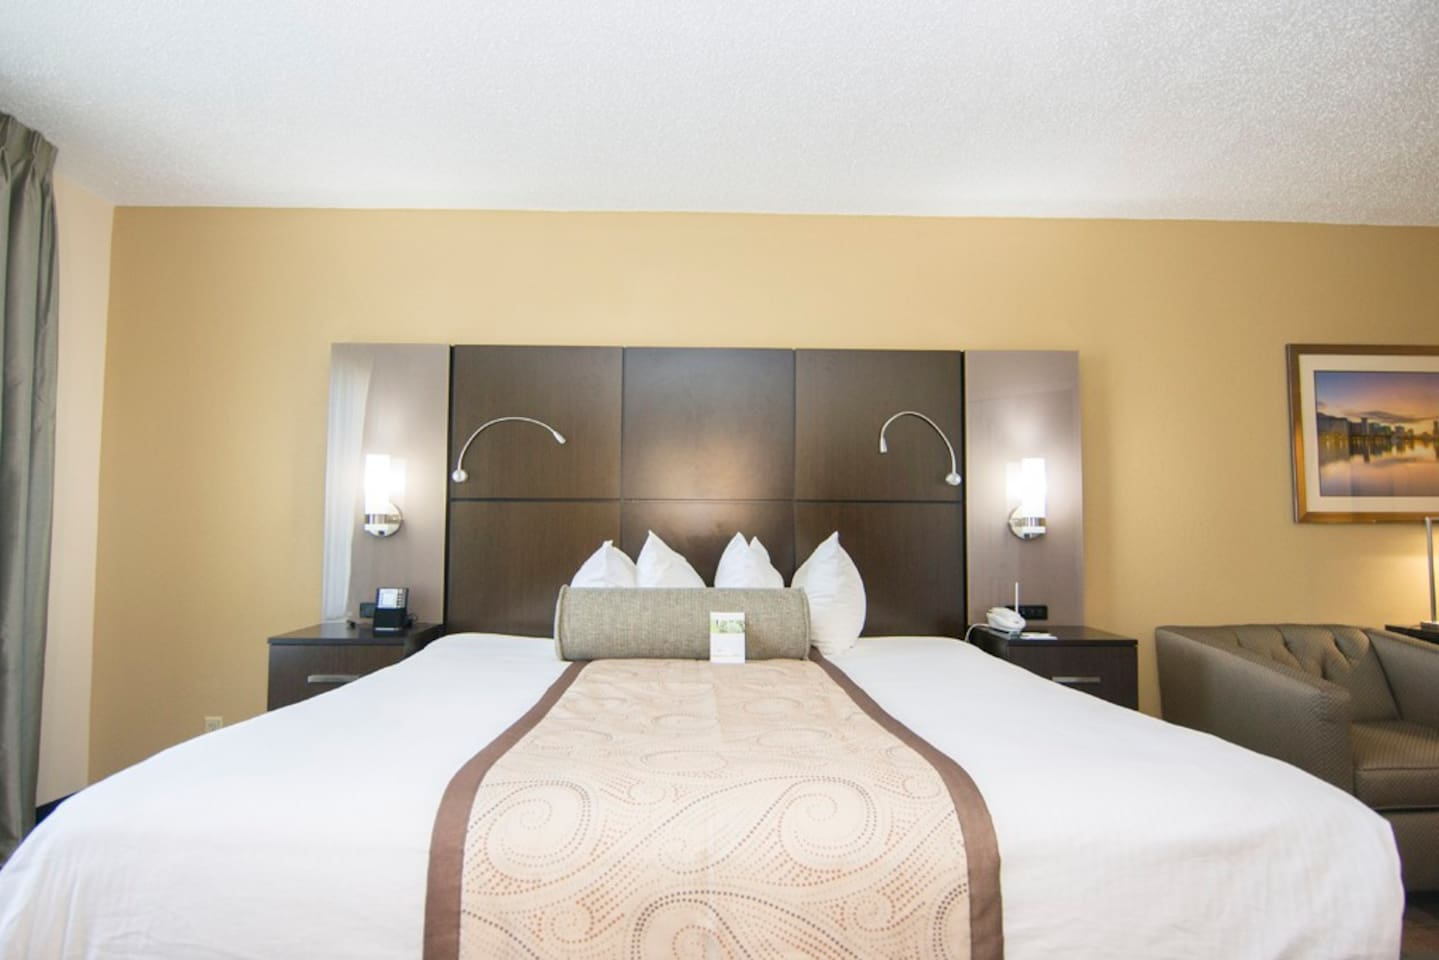 One Bedroom Suites Orlando 1 Room King Bedroom Jacuzzi Suite In Orlando Florida United States